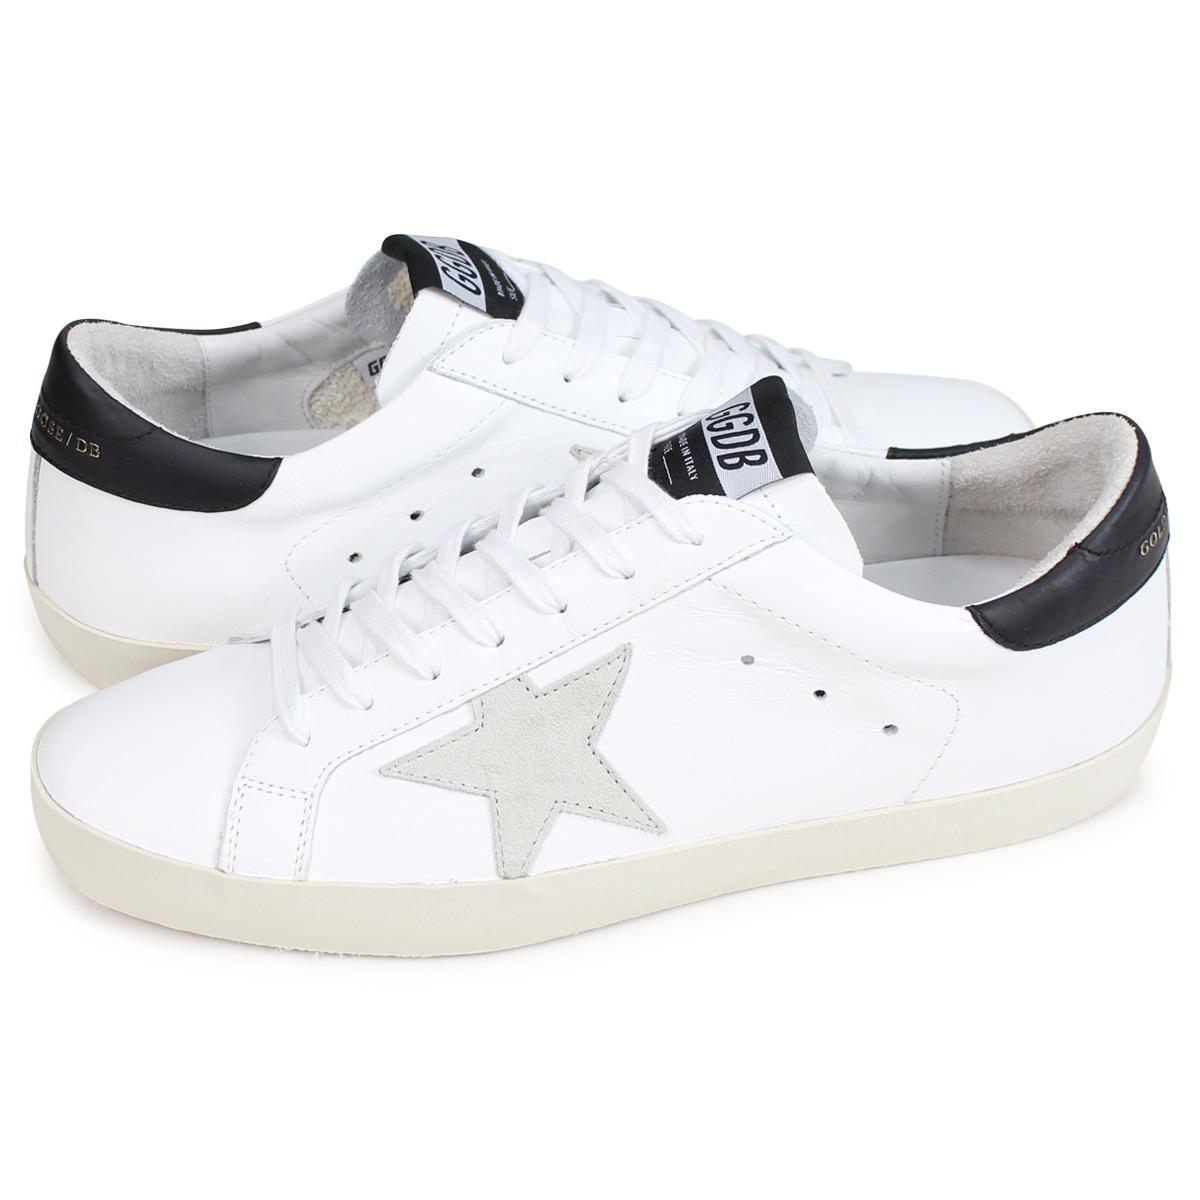 b2e76ca4f8 Golden Goose SNEAKERS SUPERSTAR golden goose sneakers men superstar white  G33MS590 E73 [1811]